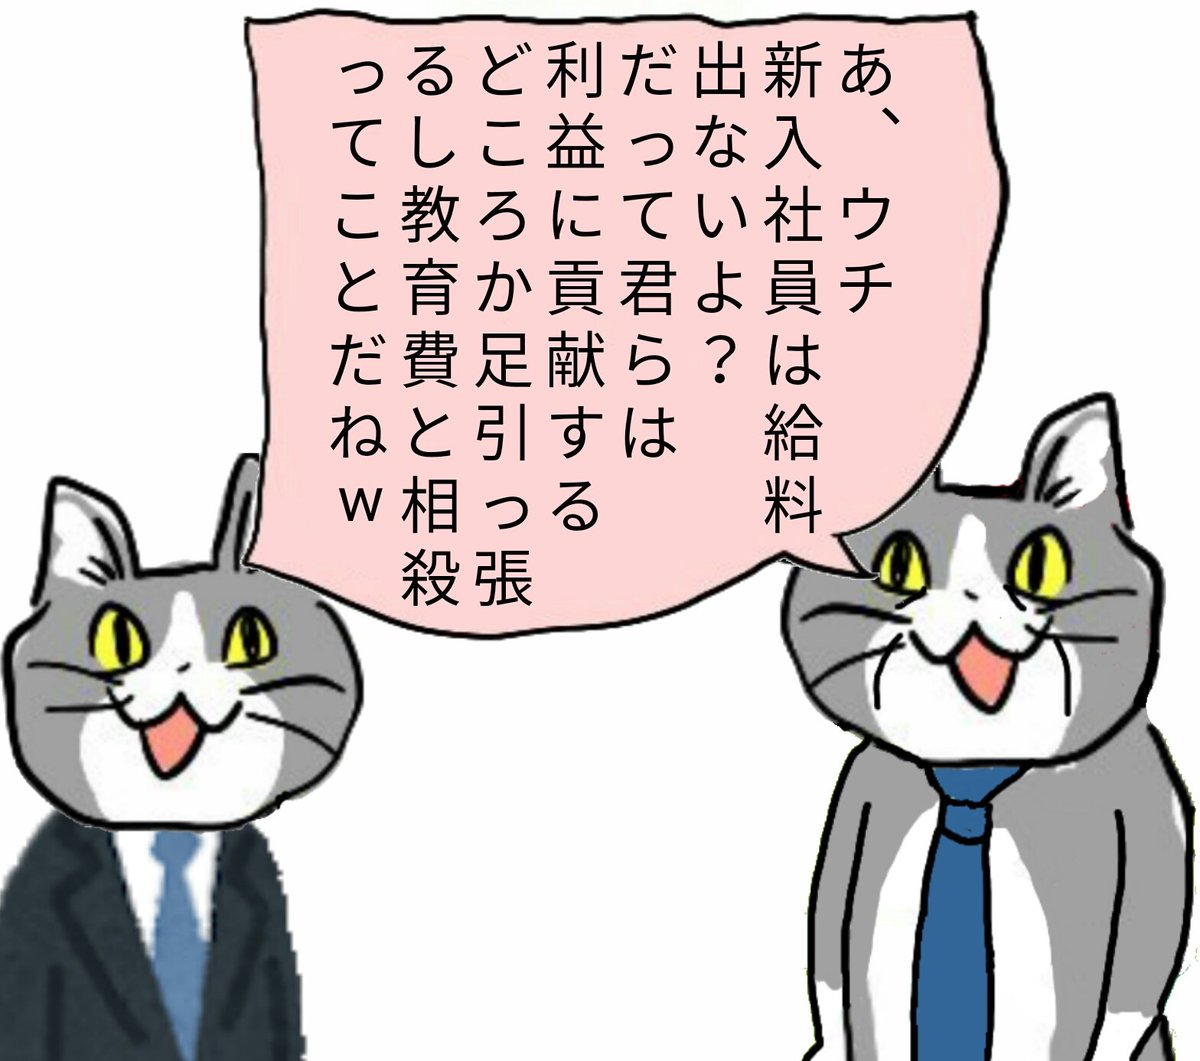 New 現場猫 労災 なんj , MOZAMIC